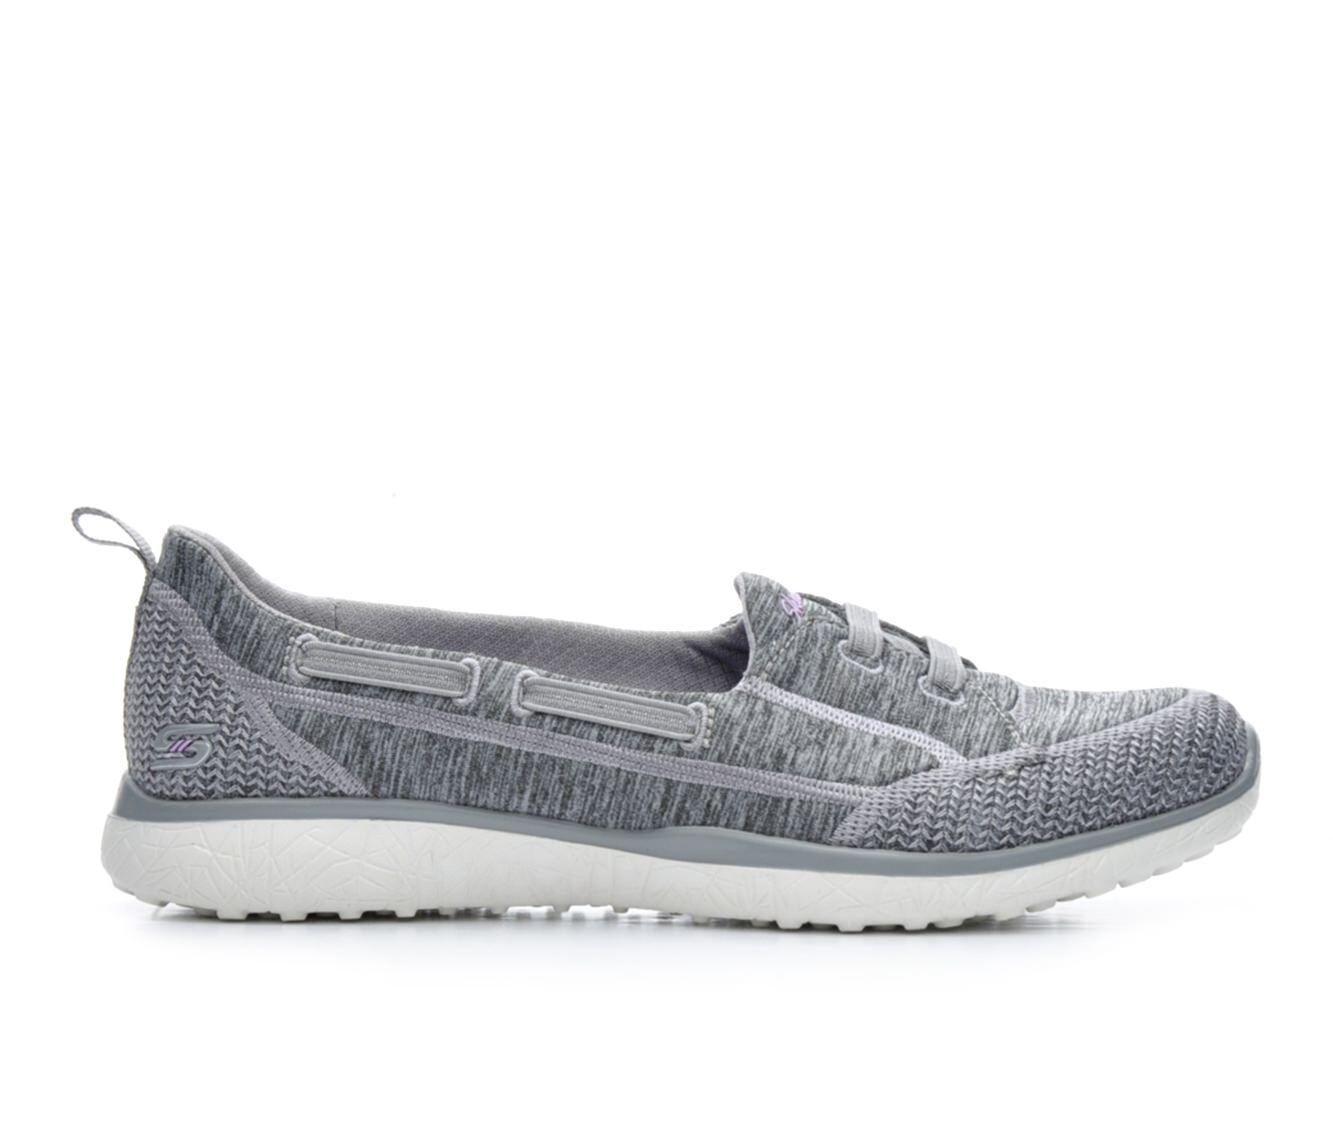 Skechers Grey Casual Sneakers clearance amazing price me5owEL4